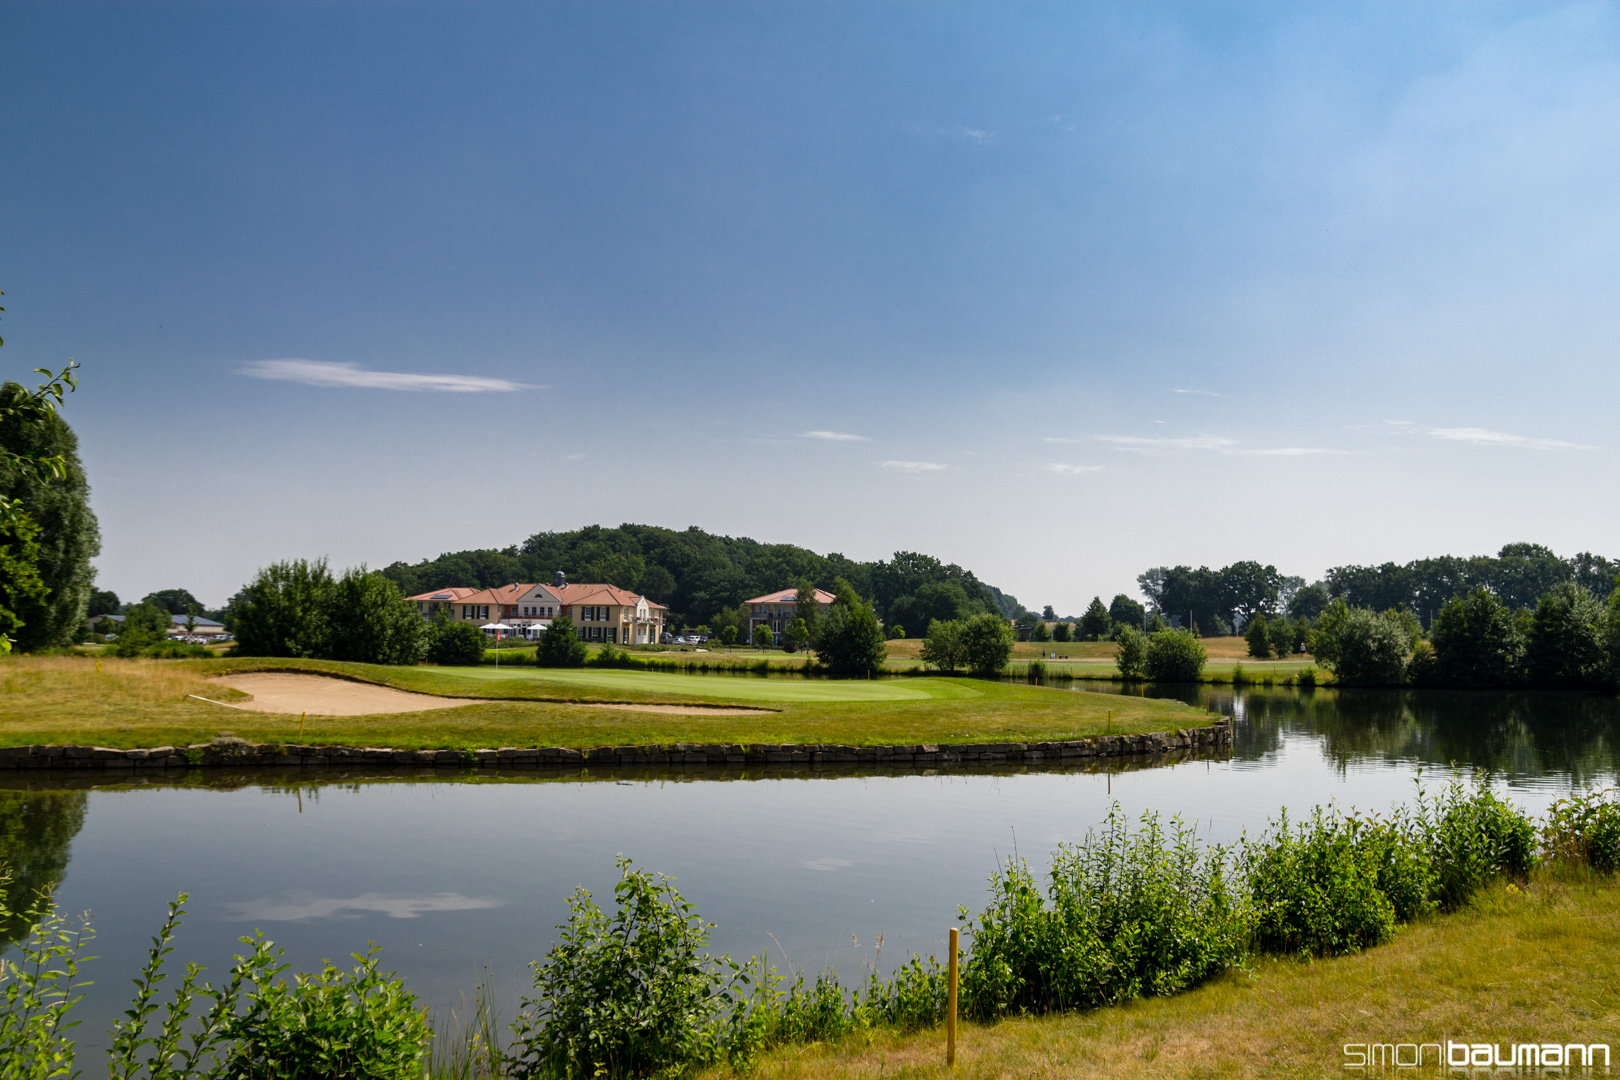 12. NCL-Golf-Trophy in Adendorf am 14.05.2017, Castanea Golf Resort